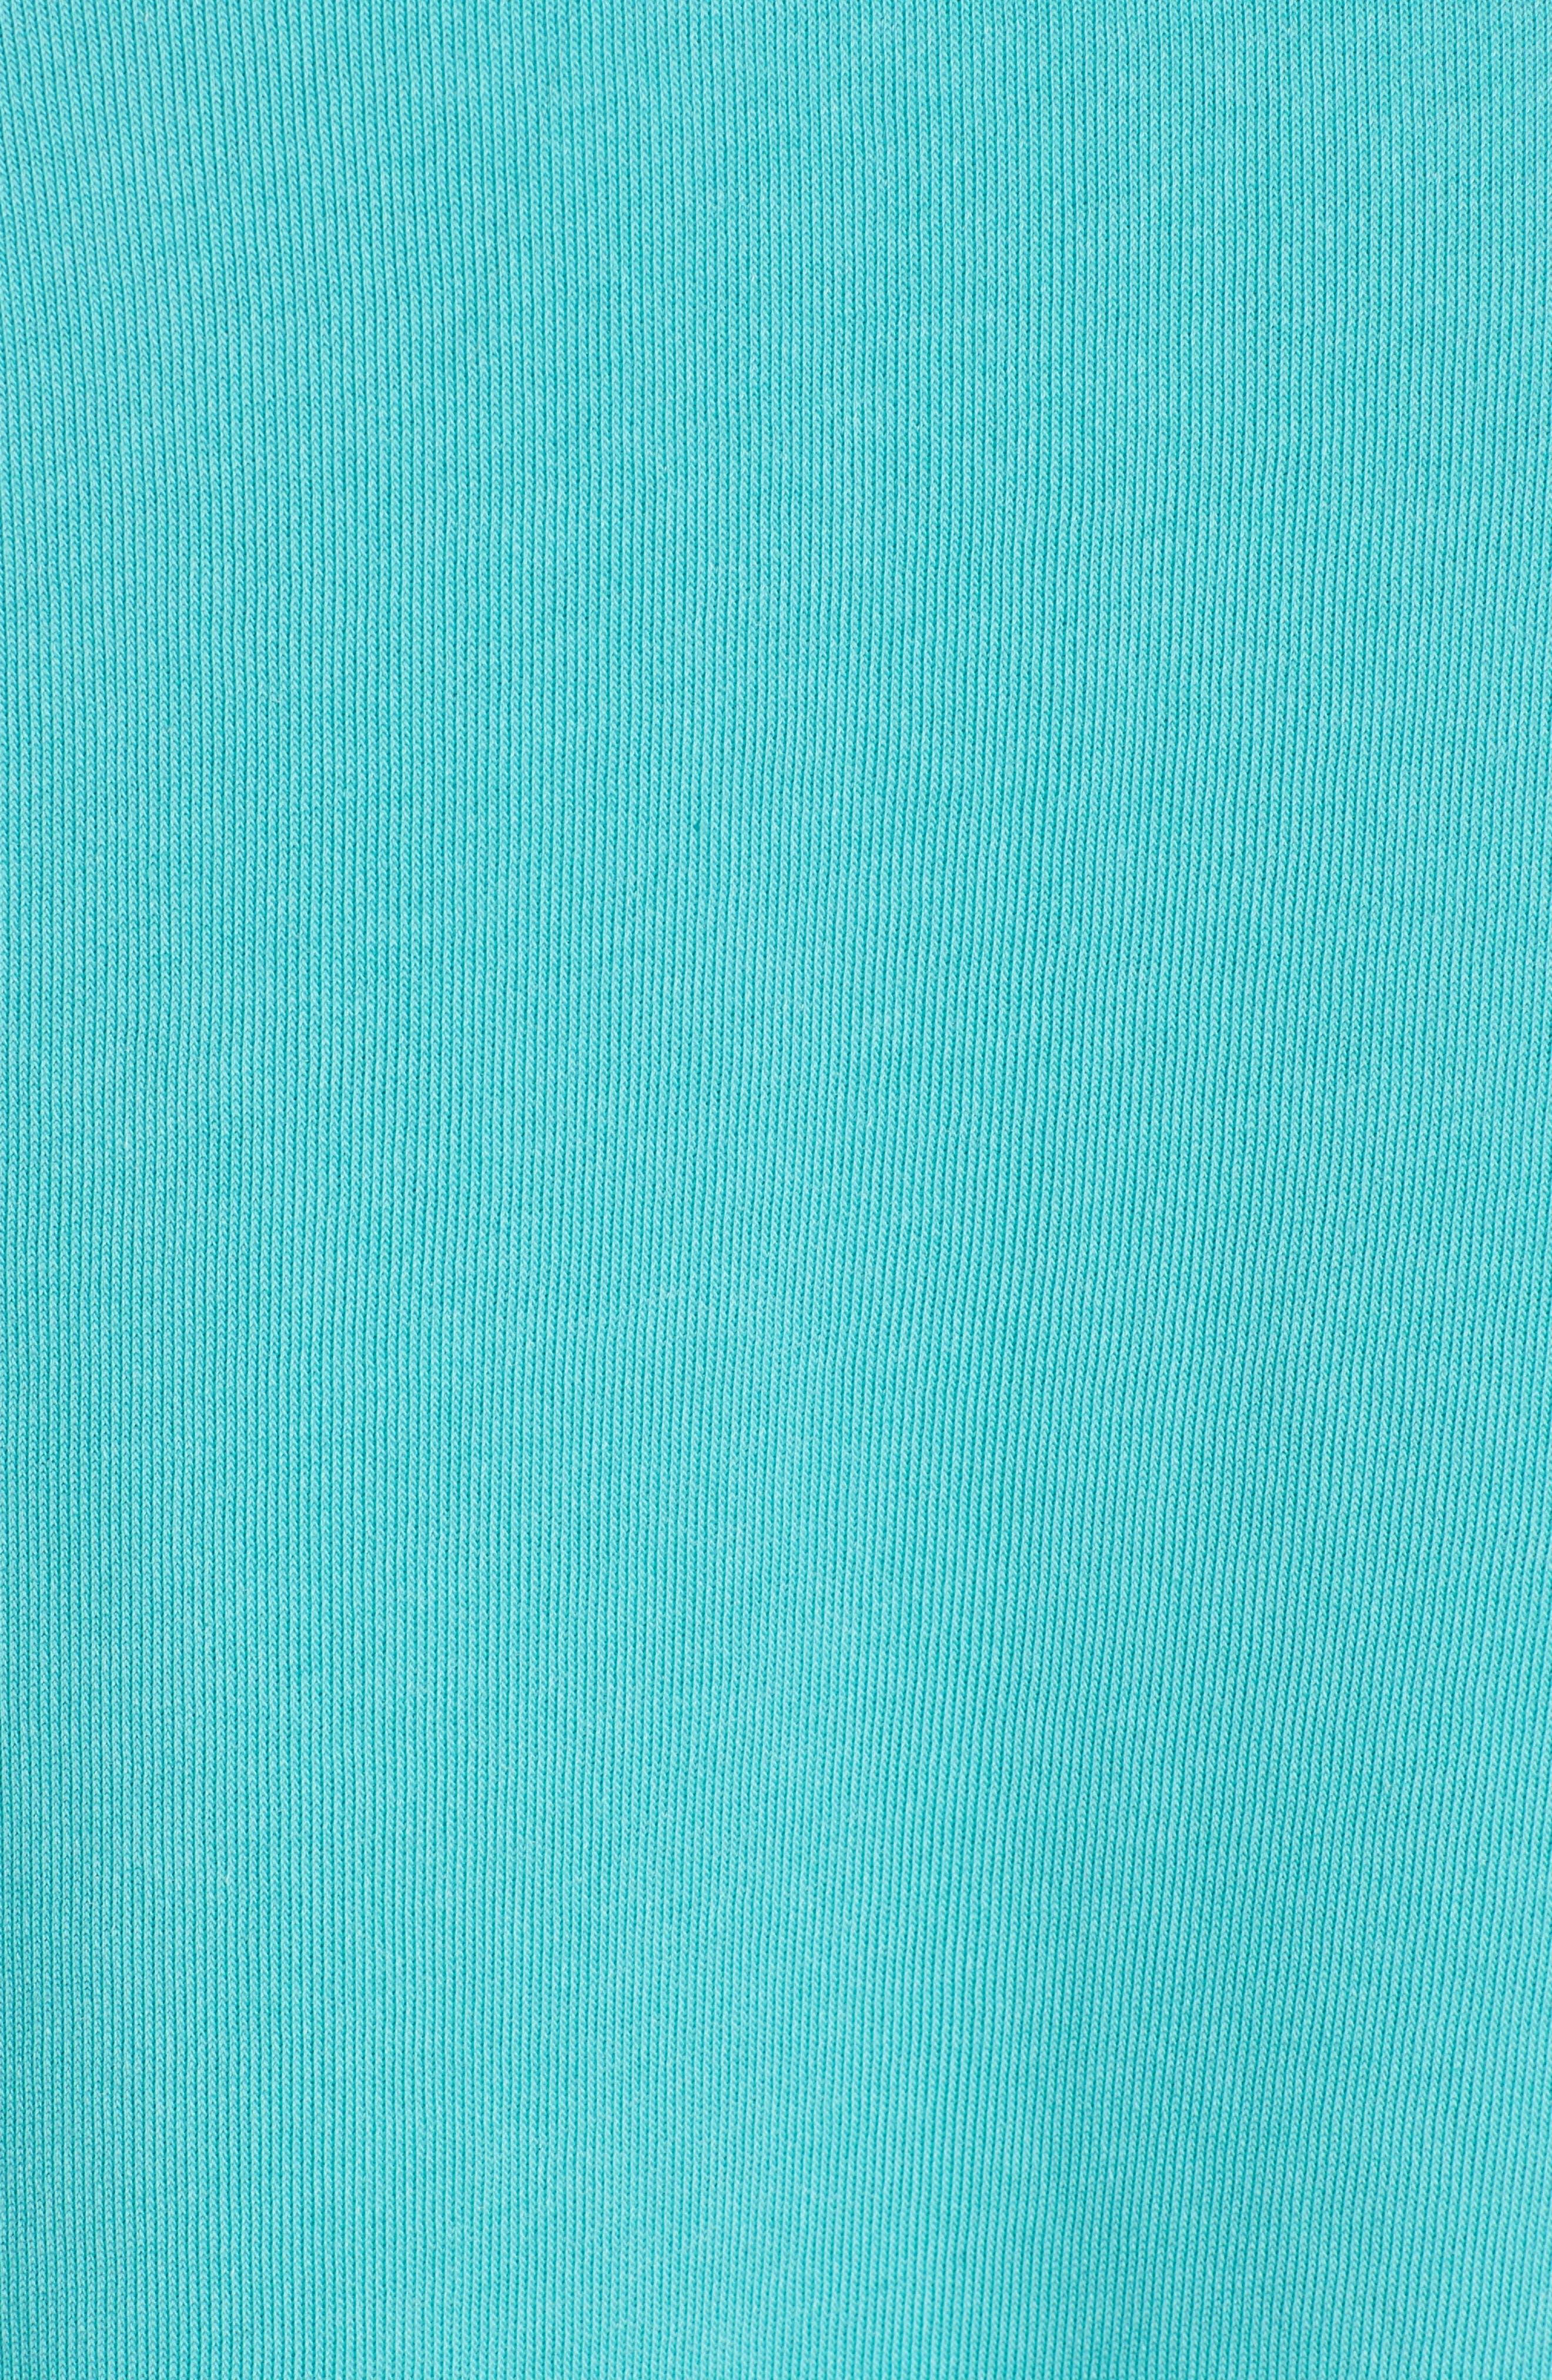 Heirlooms Sommers Sweatshirt,                             Alternate thumbnail 6, color,                             Trance Teal